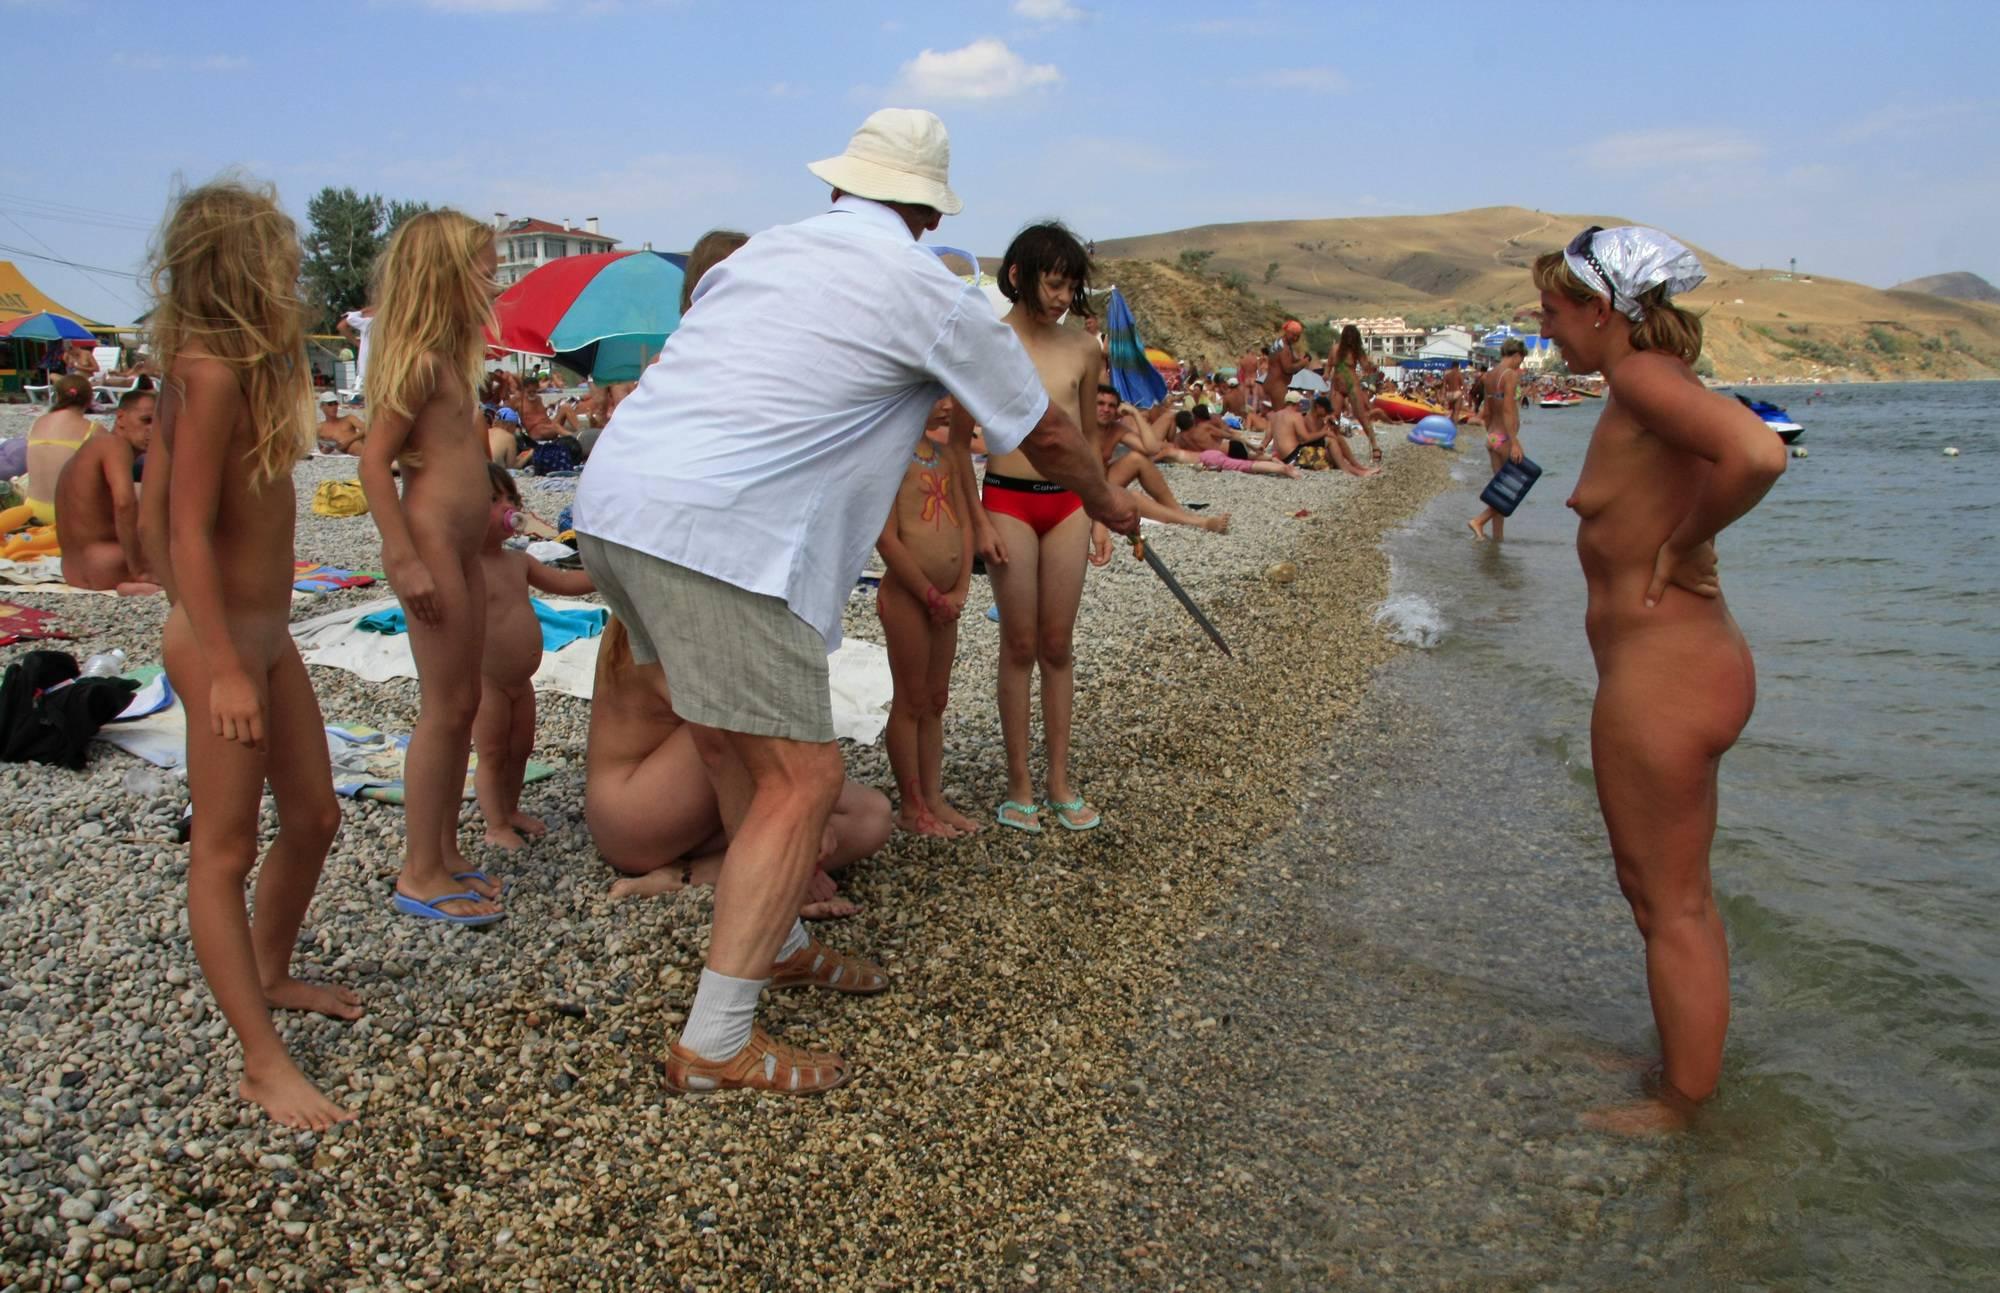 Ukrainian Water Splashing - 1